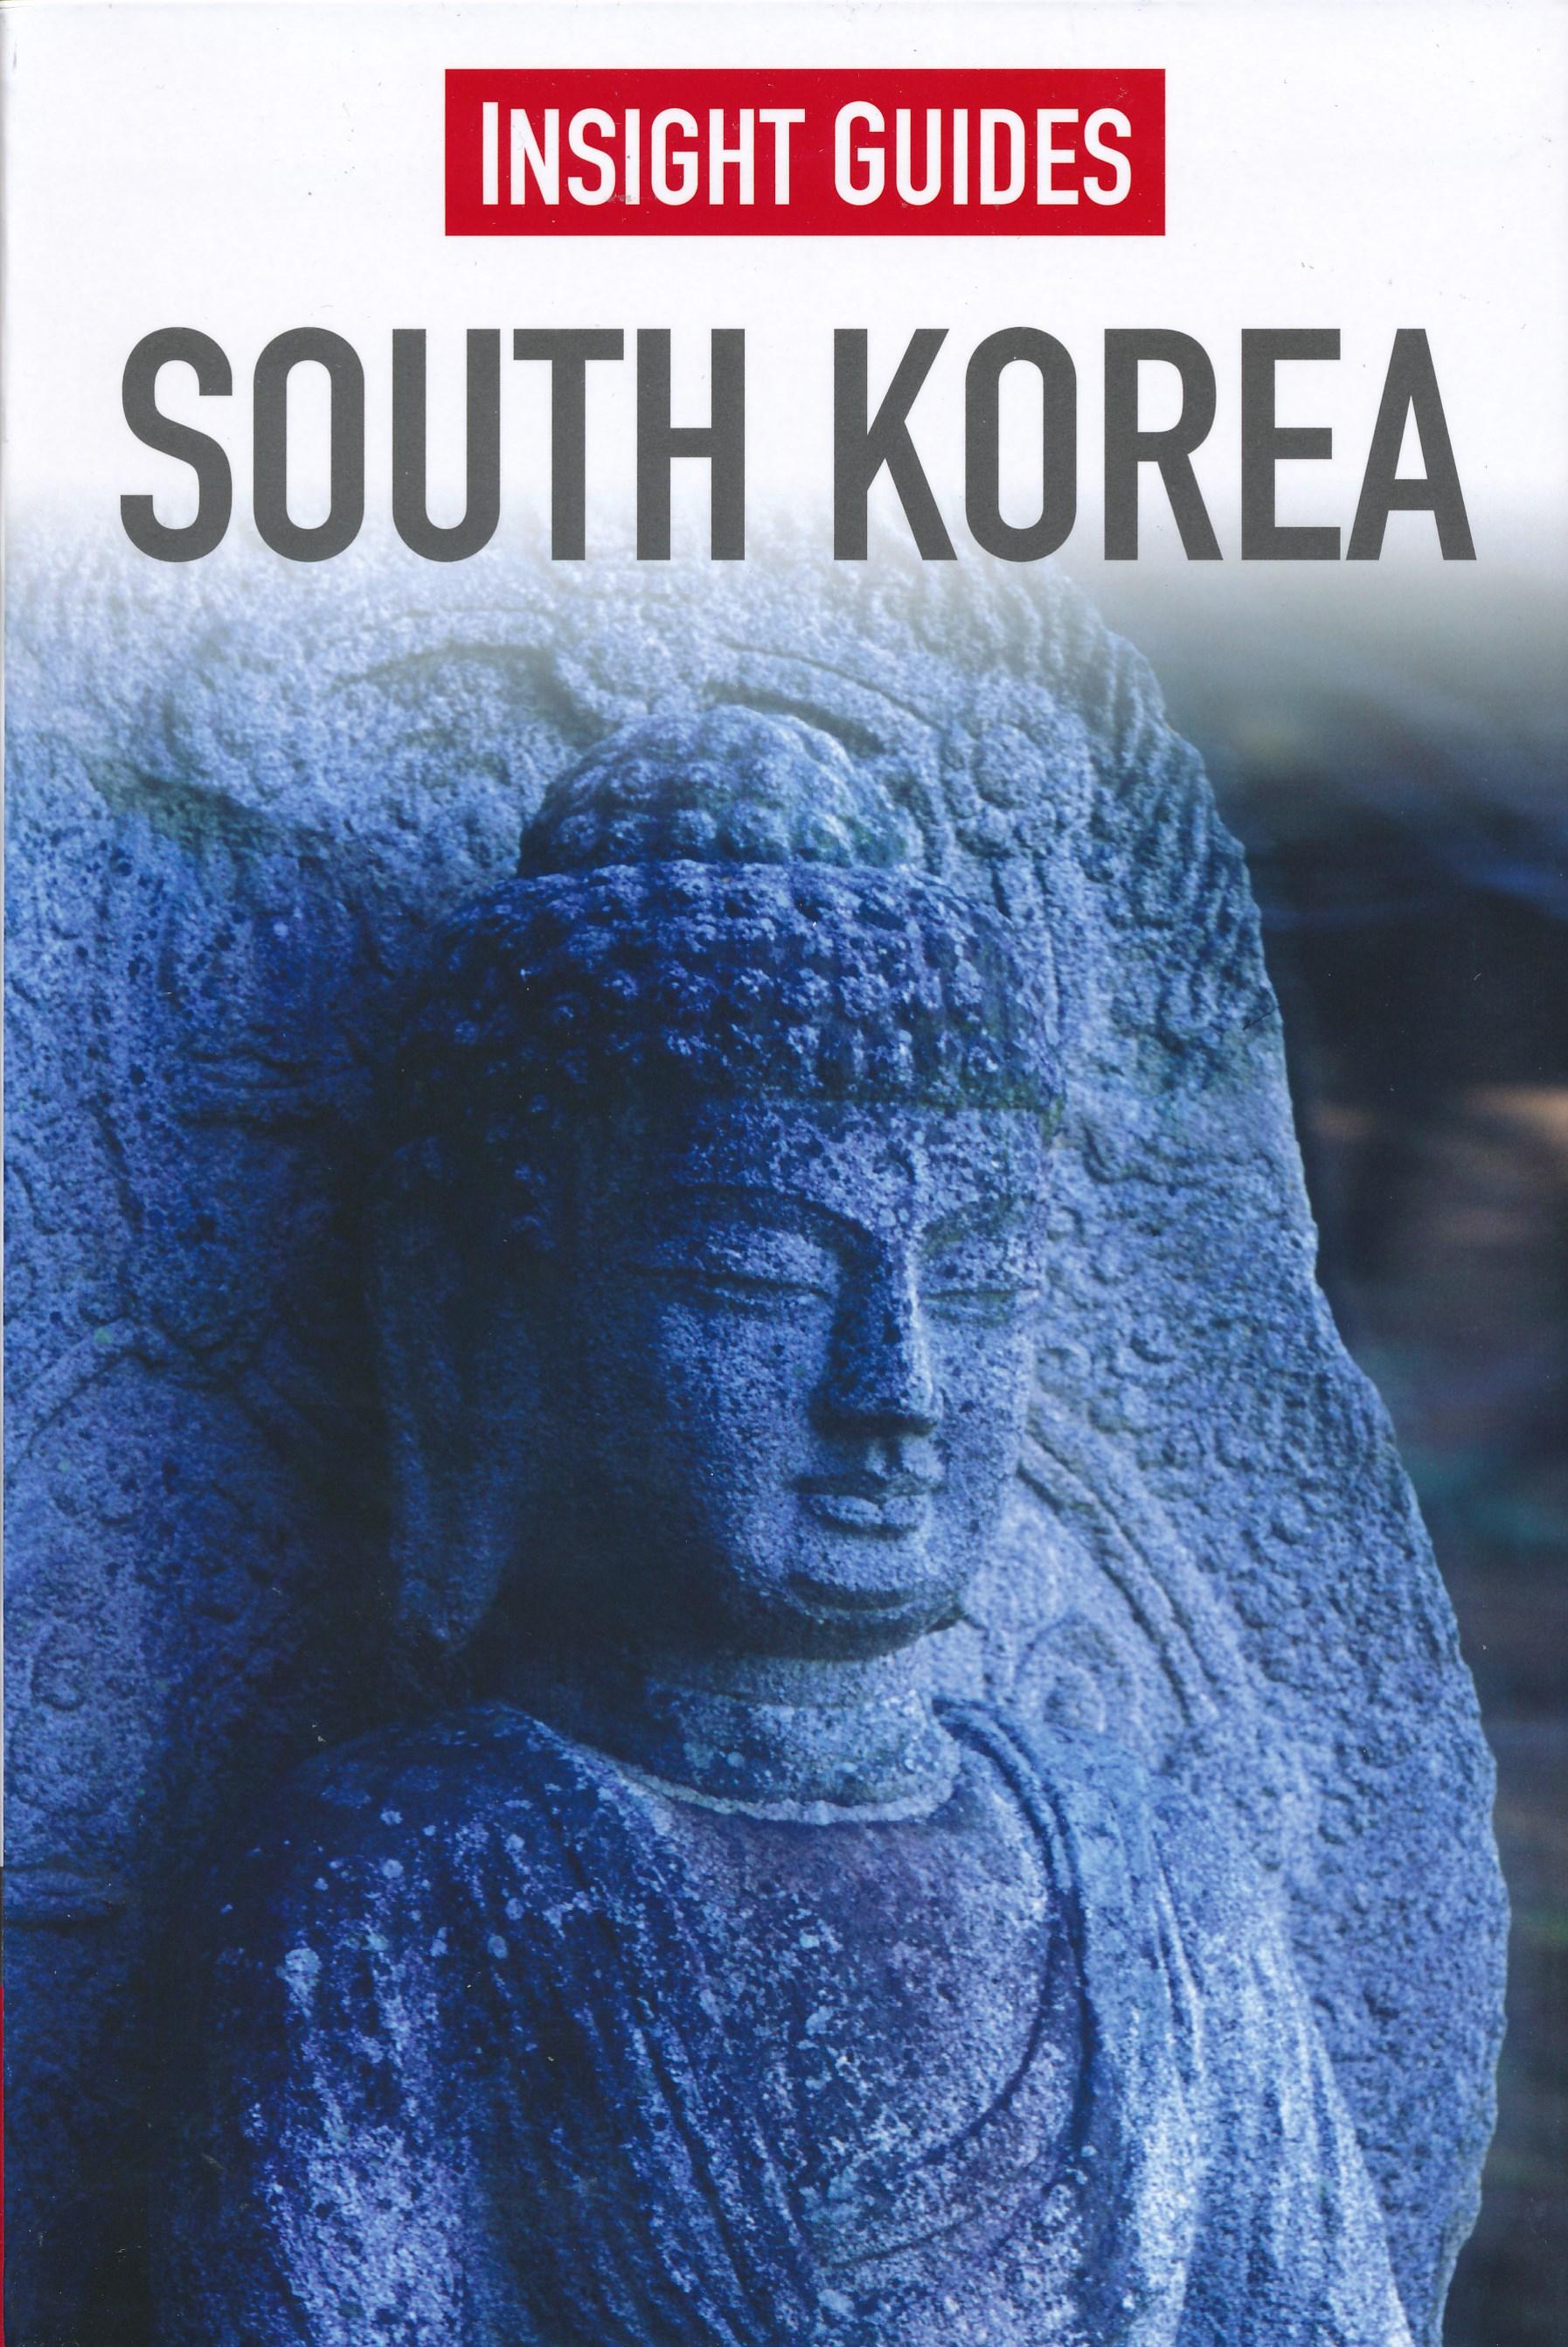 Reisgids South Korea - Zuid Korea   Insight Guides (Engelstalig)